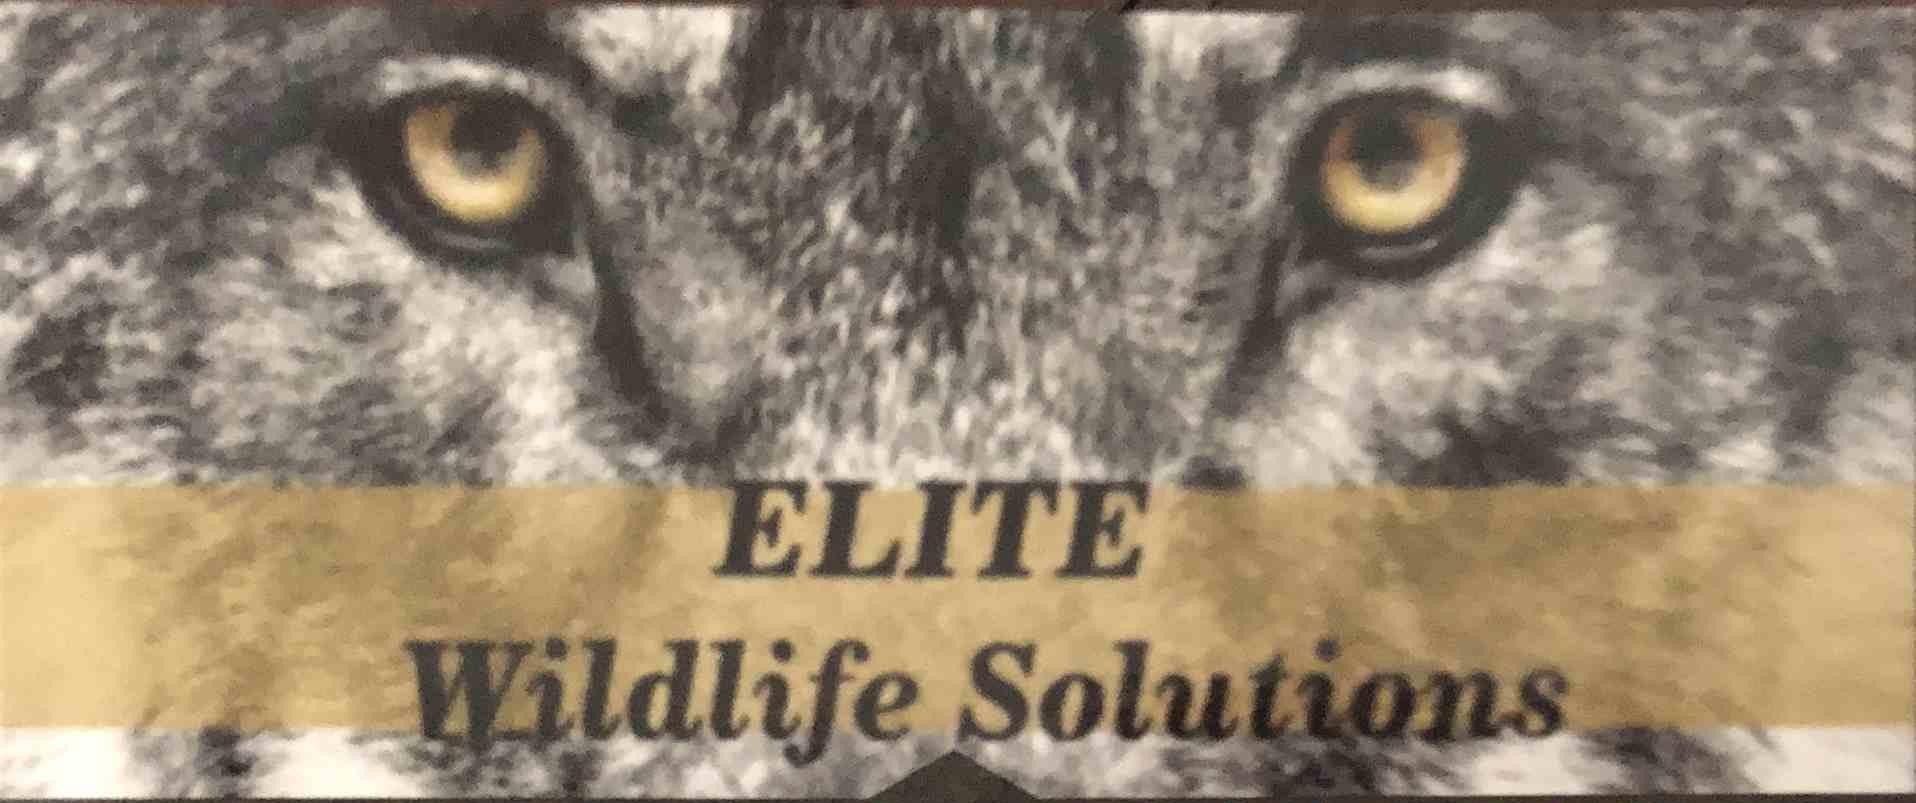 Elite Wildlife Solutions